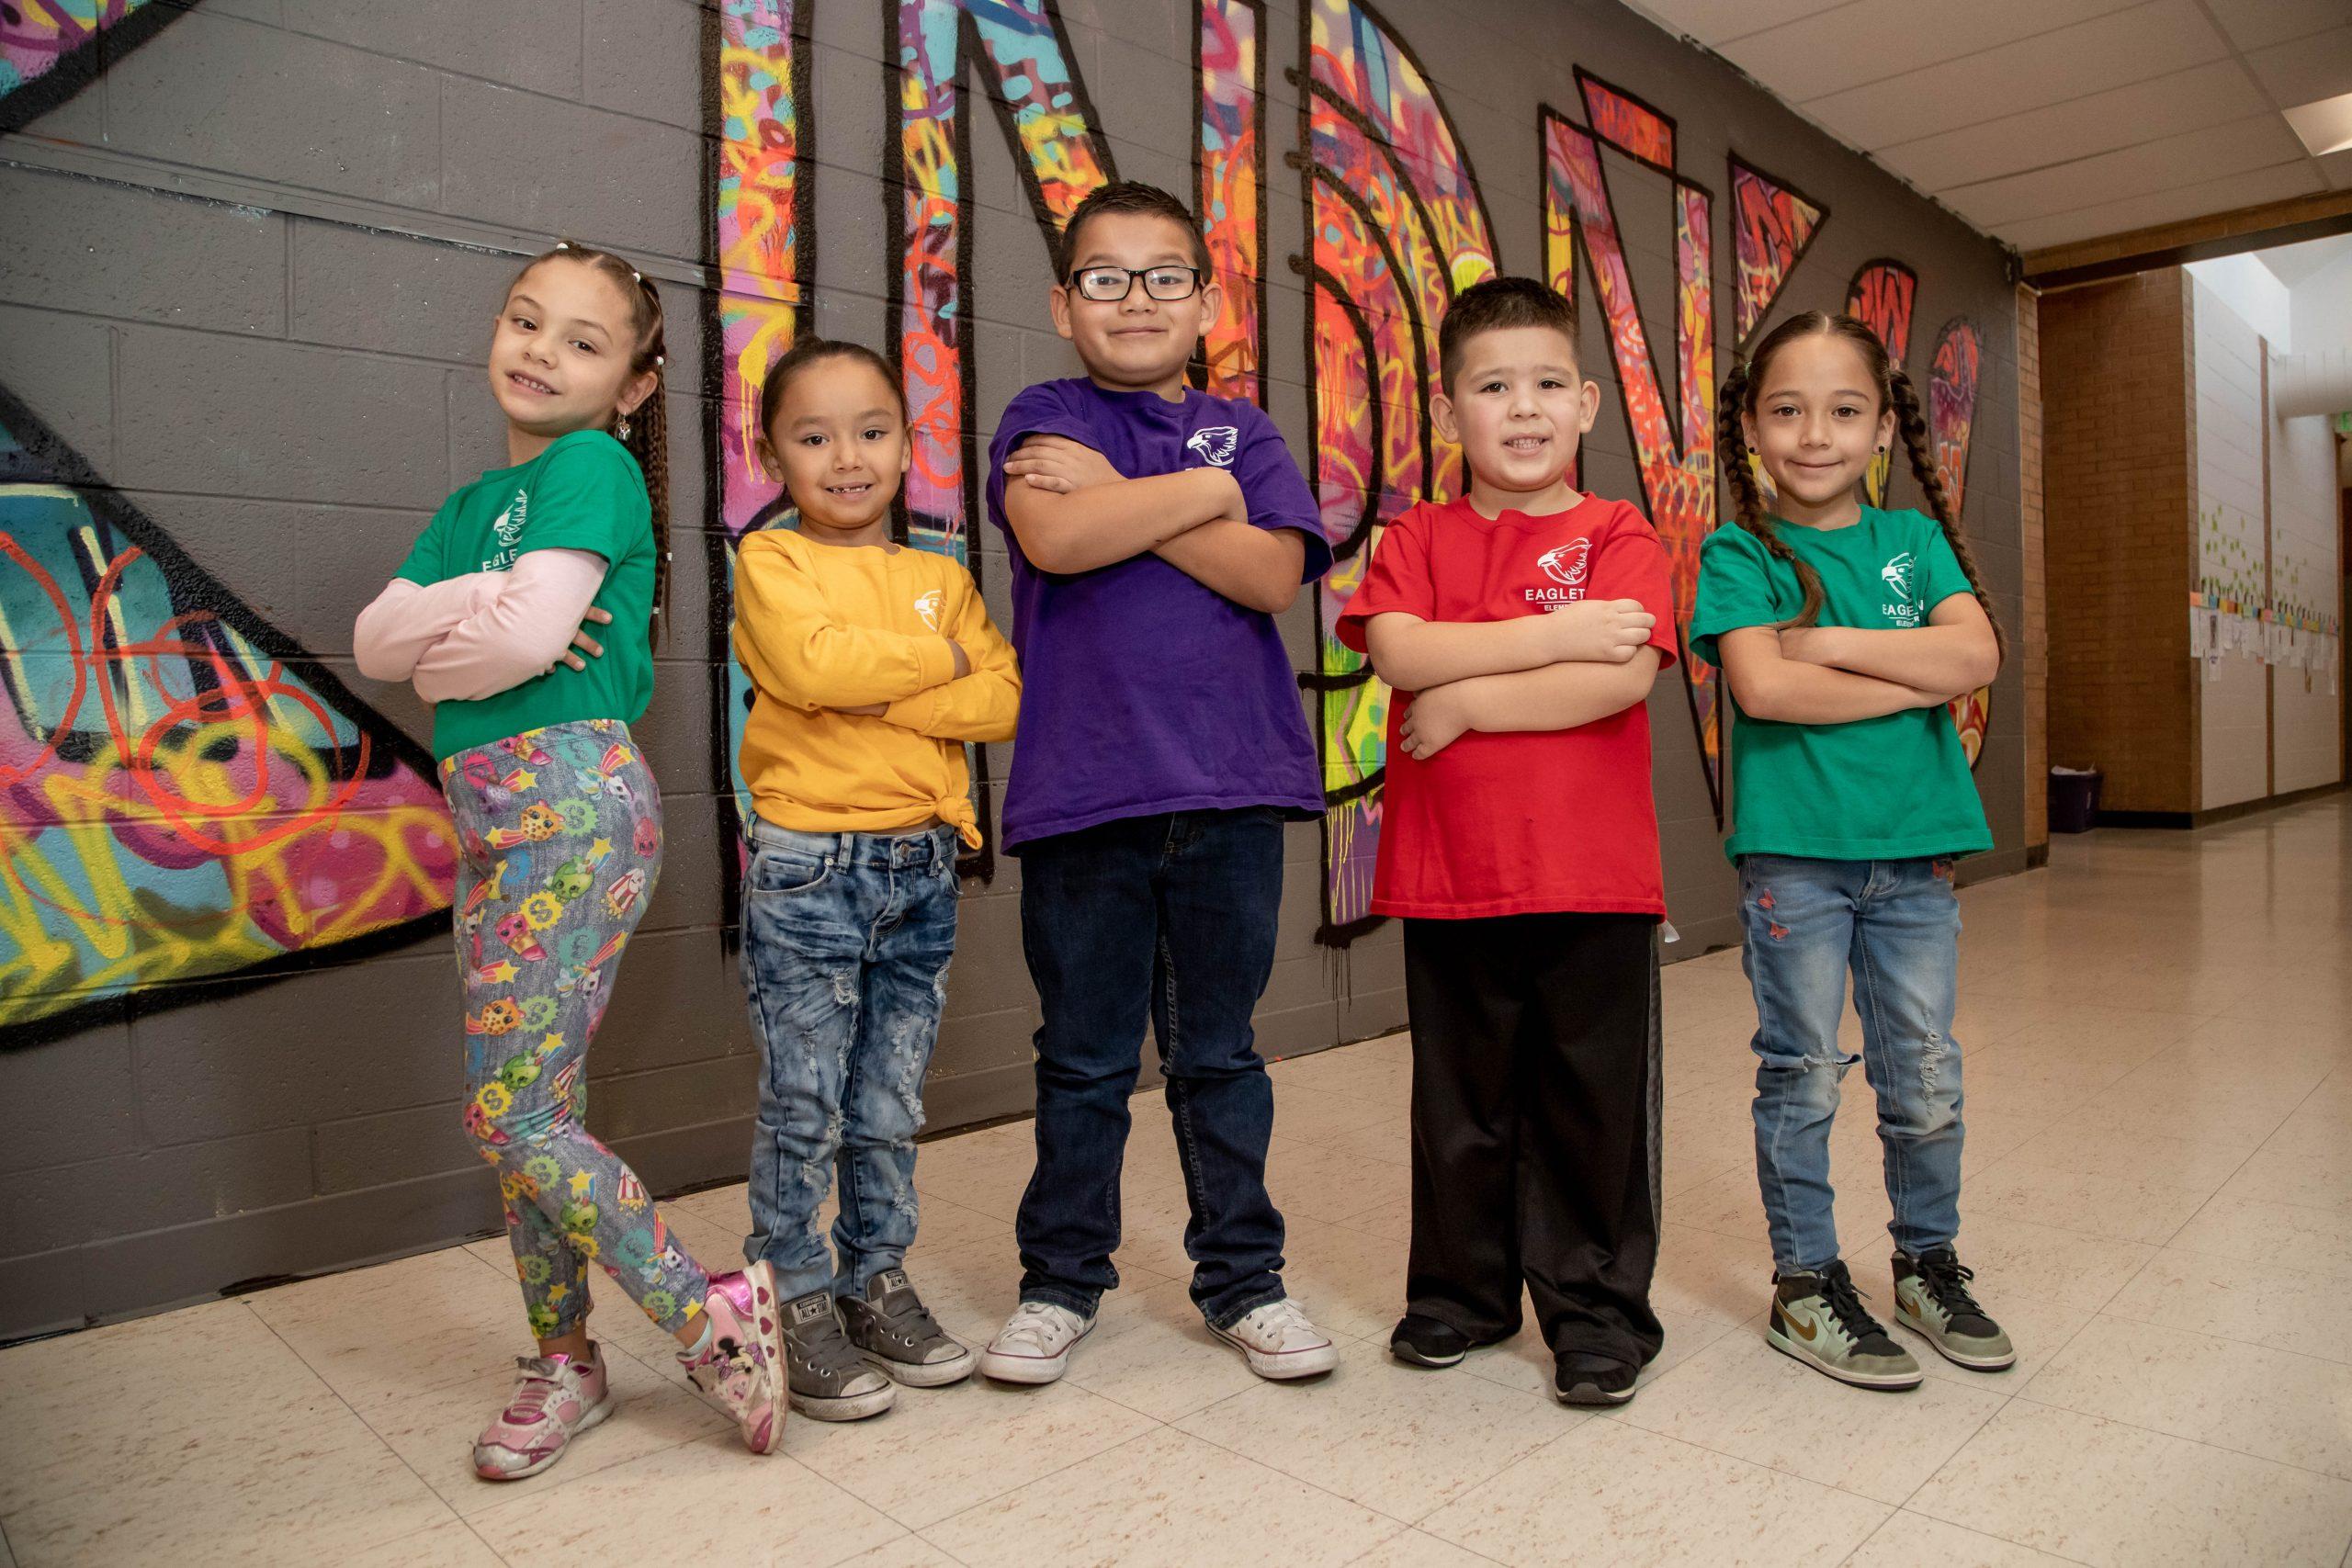 Five students in a school hallway